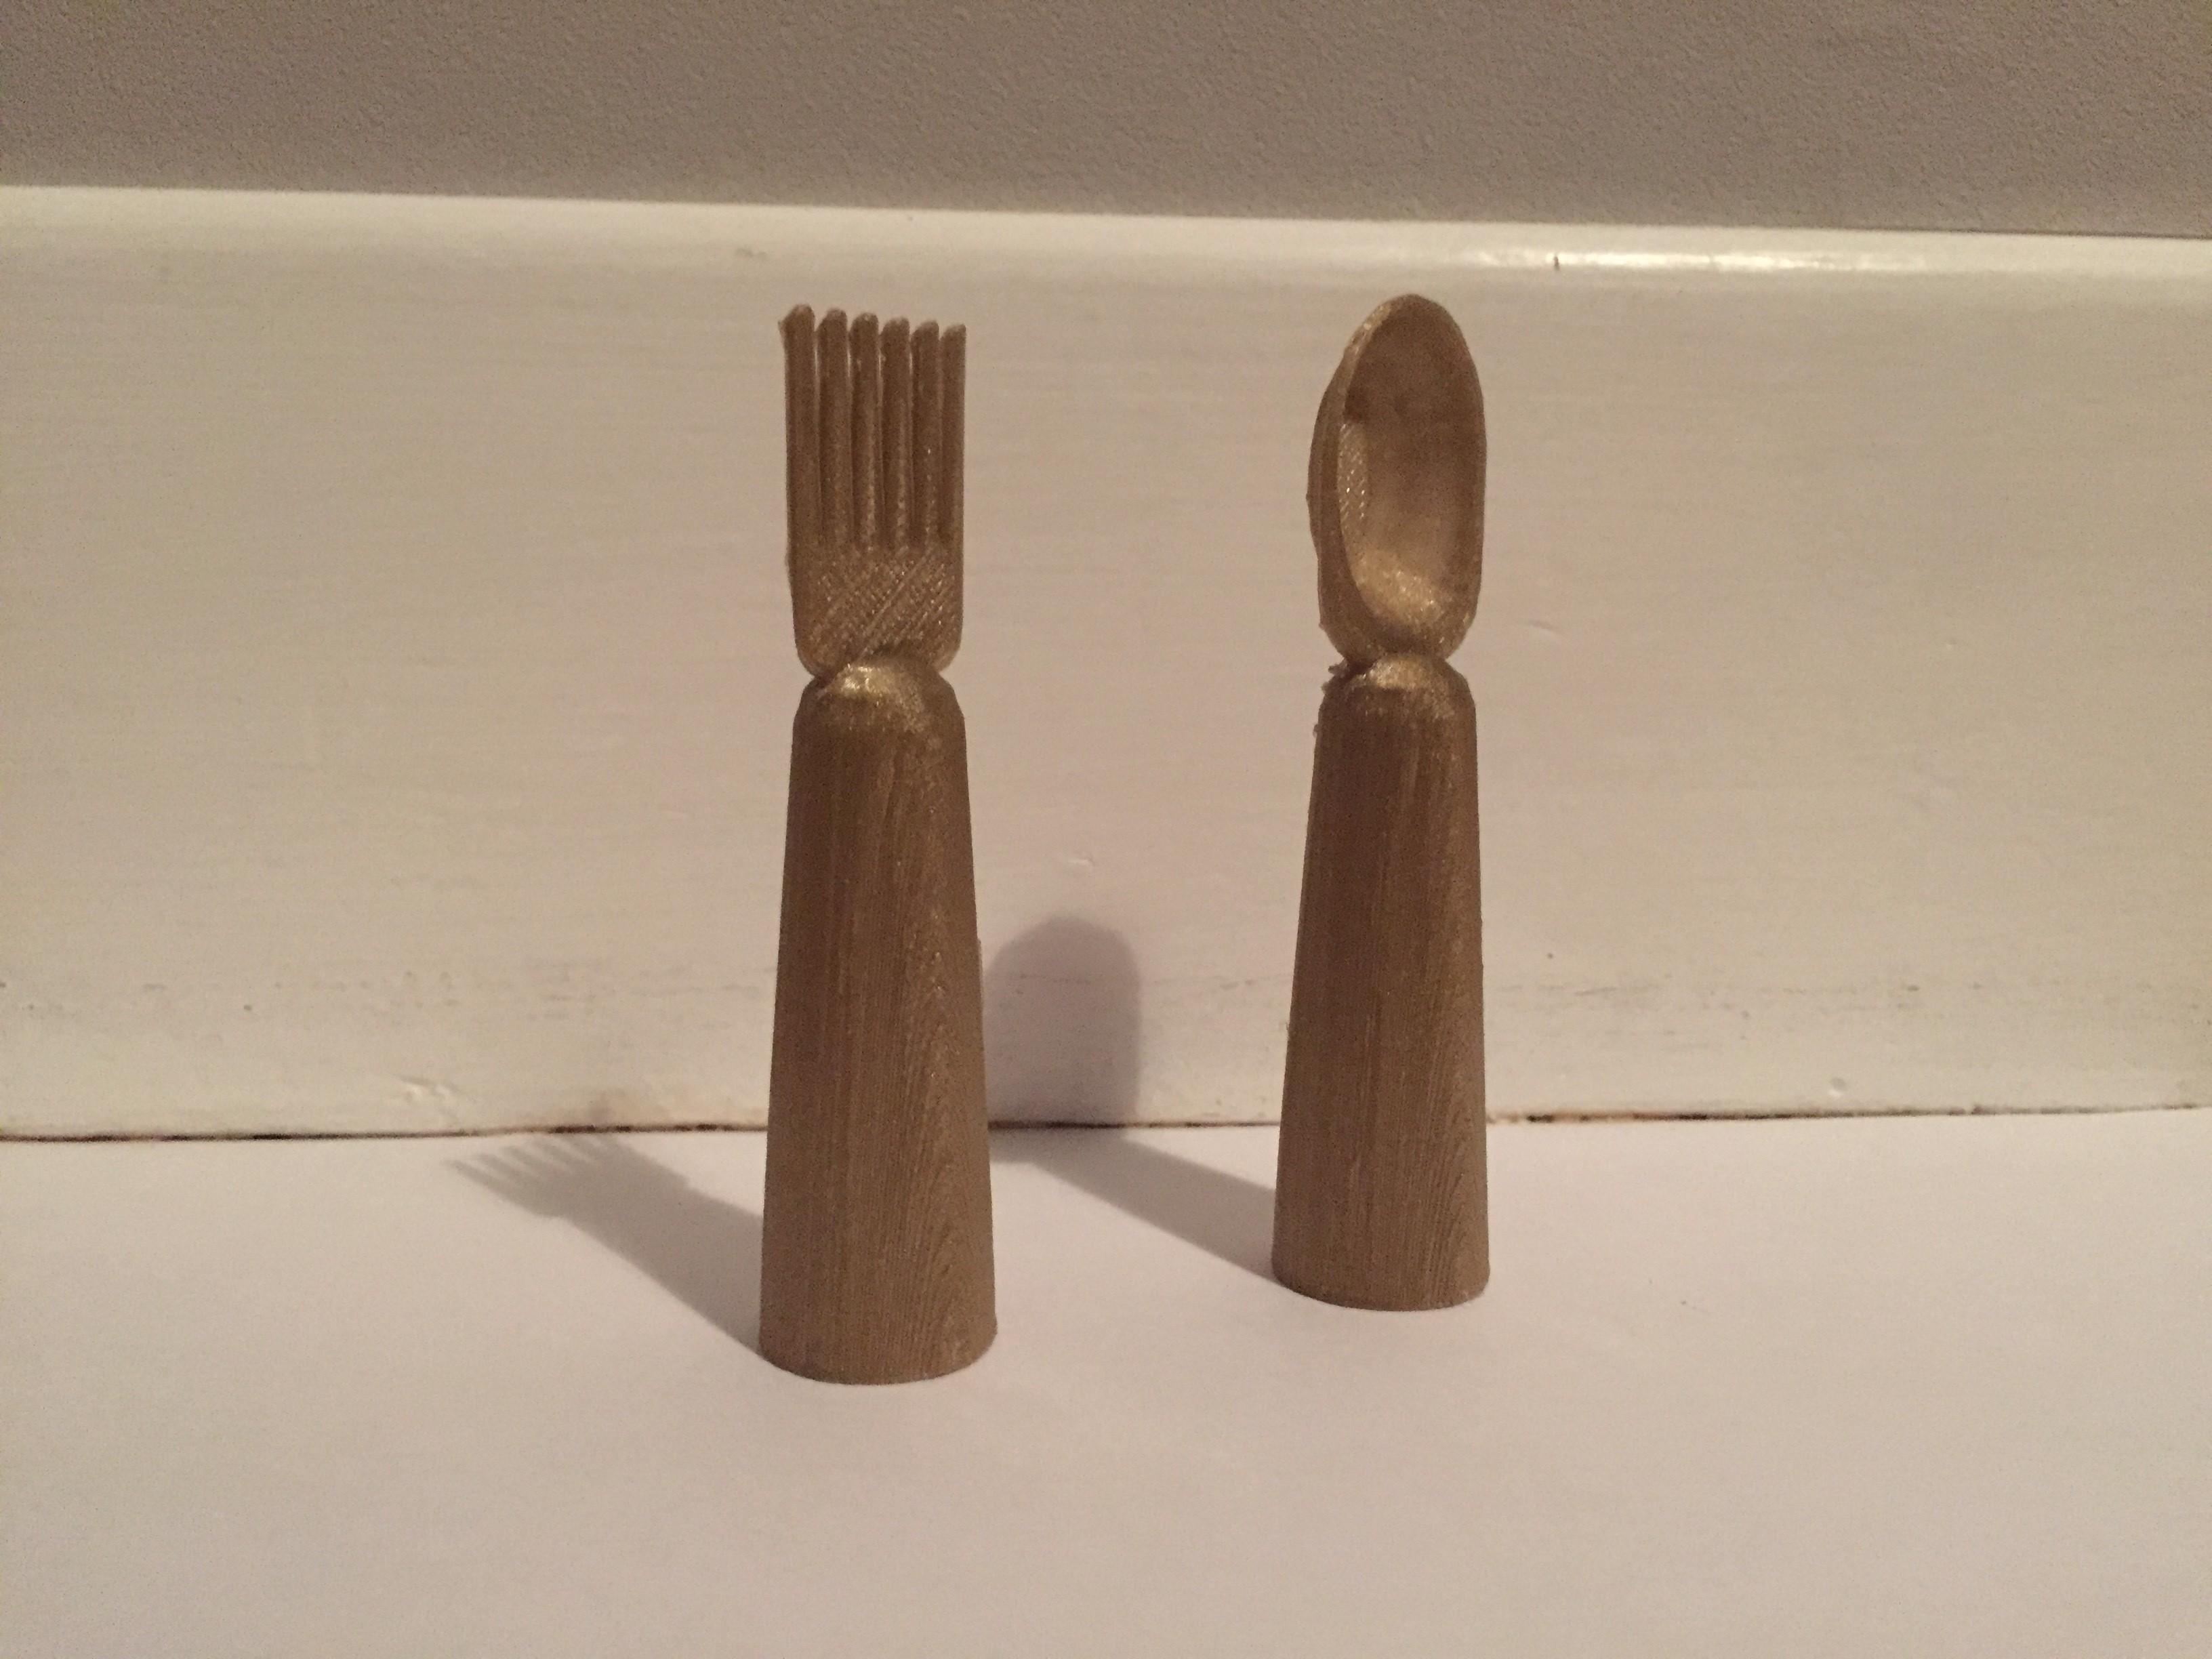 IMG_5347.JPG Download free STL file Cutlery - Fork - Spoon • 3D printer template, mikit36